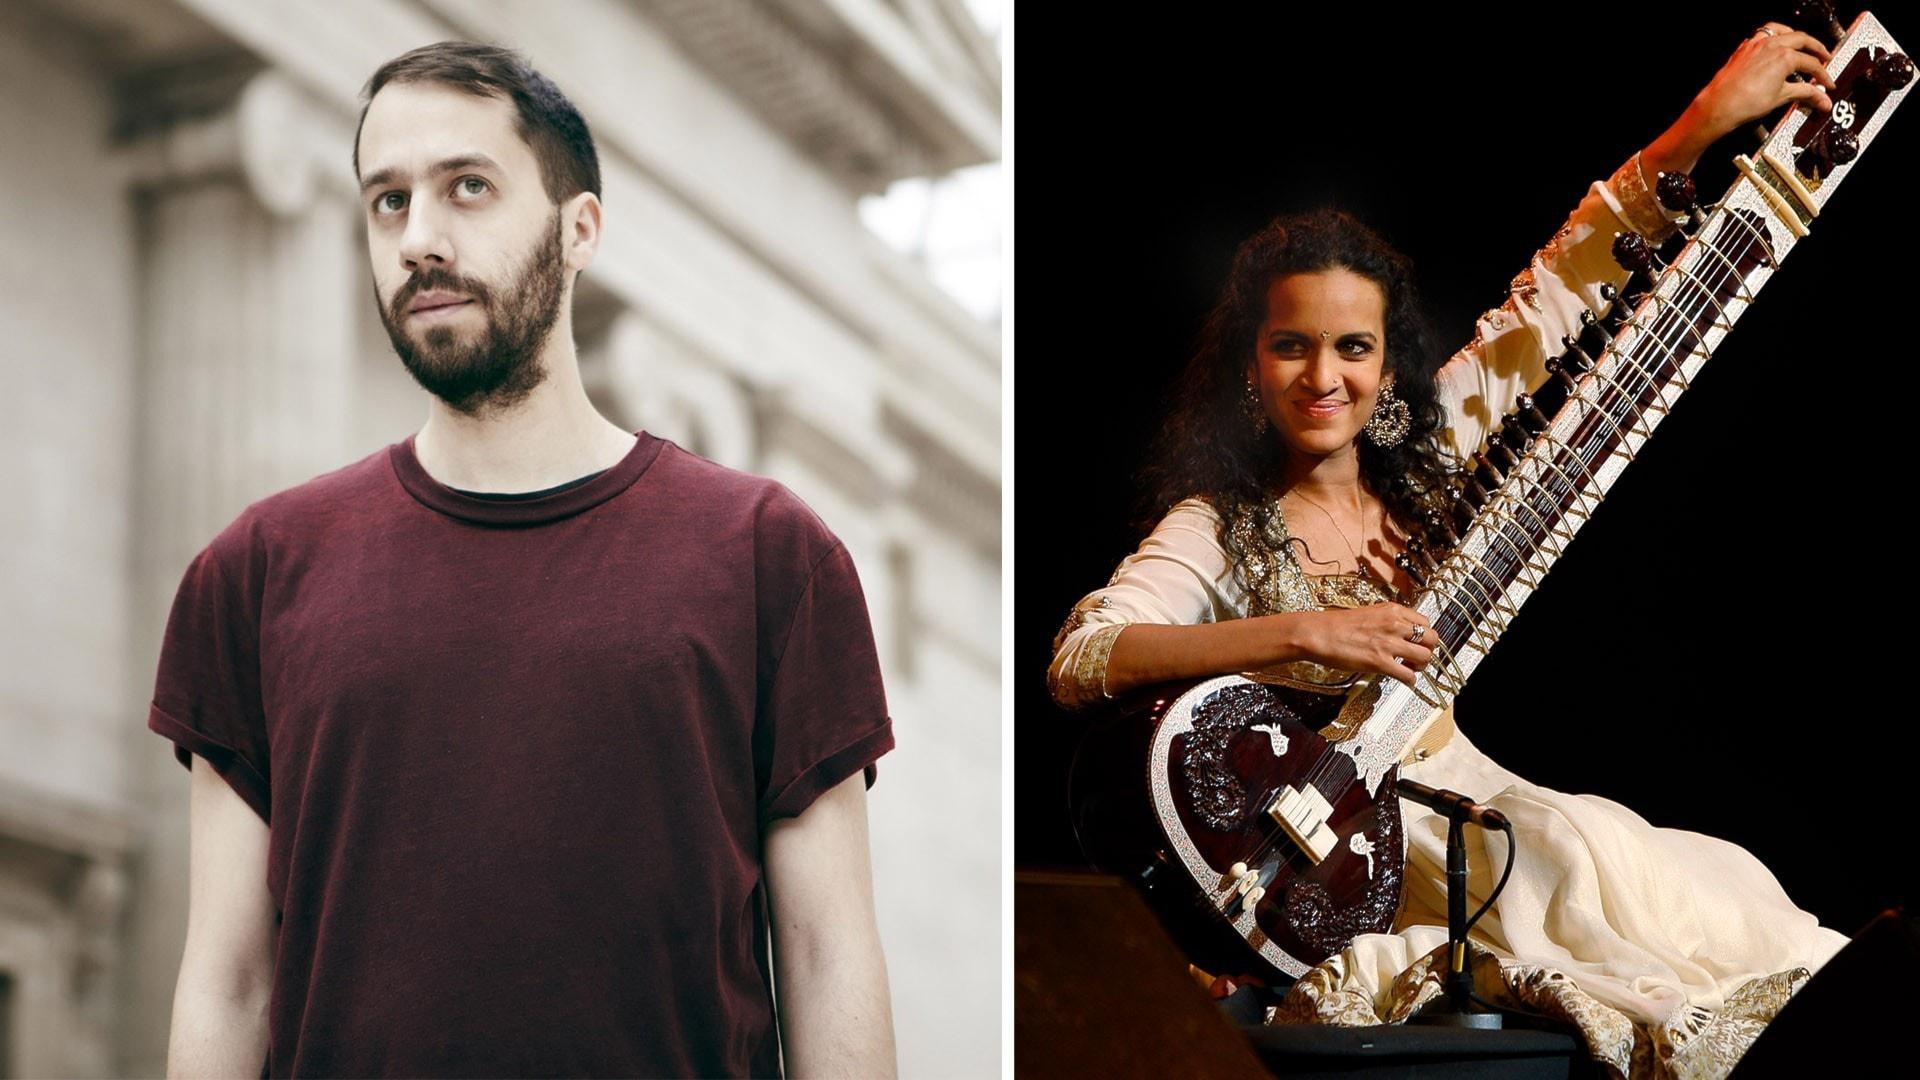 KONSERT: Sitar möter synth – Anoushka Shankar & Gold Panda